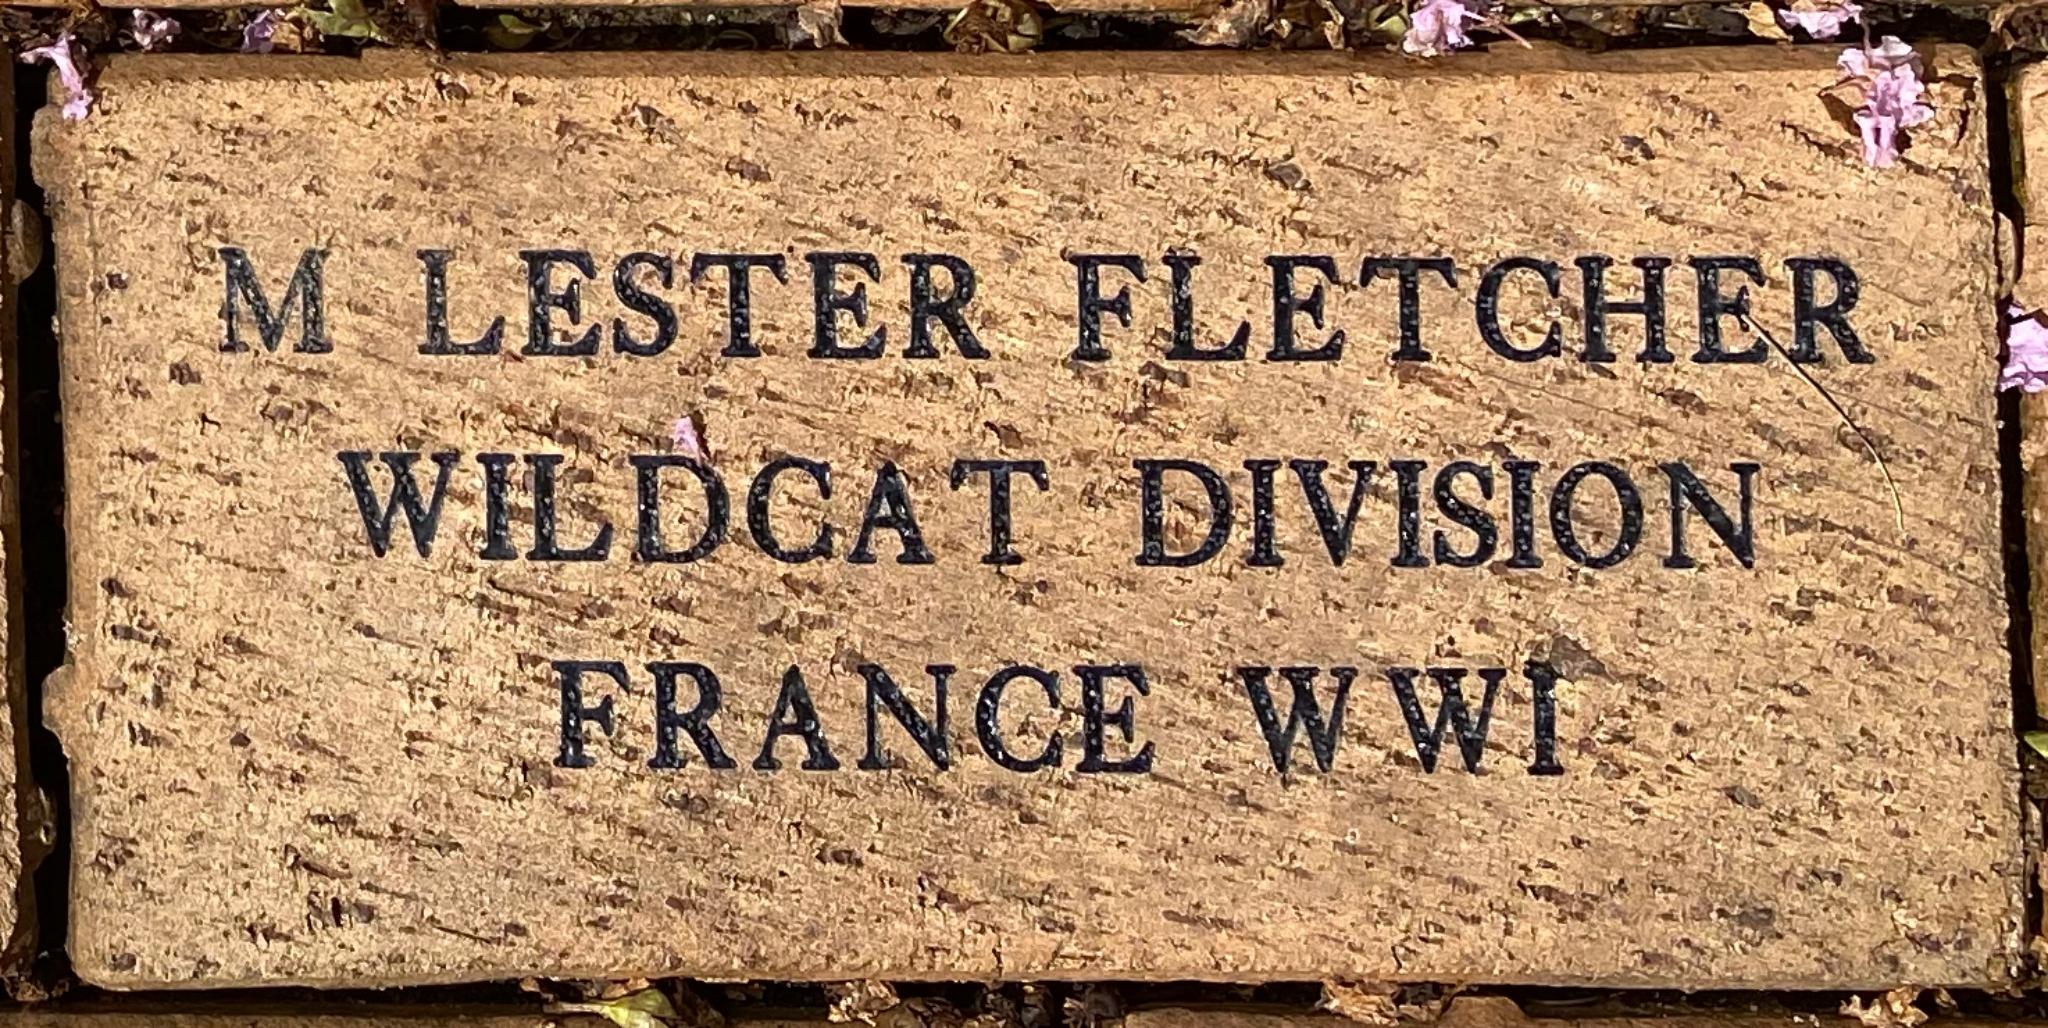 M LESTER FLETCHER WILDCAT DIVISION FRANCE WWI